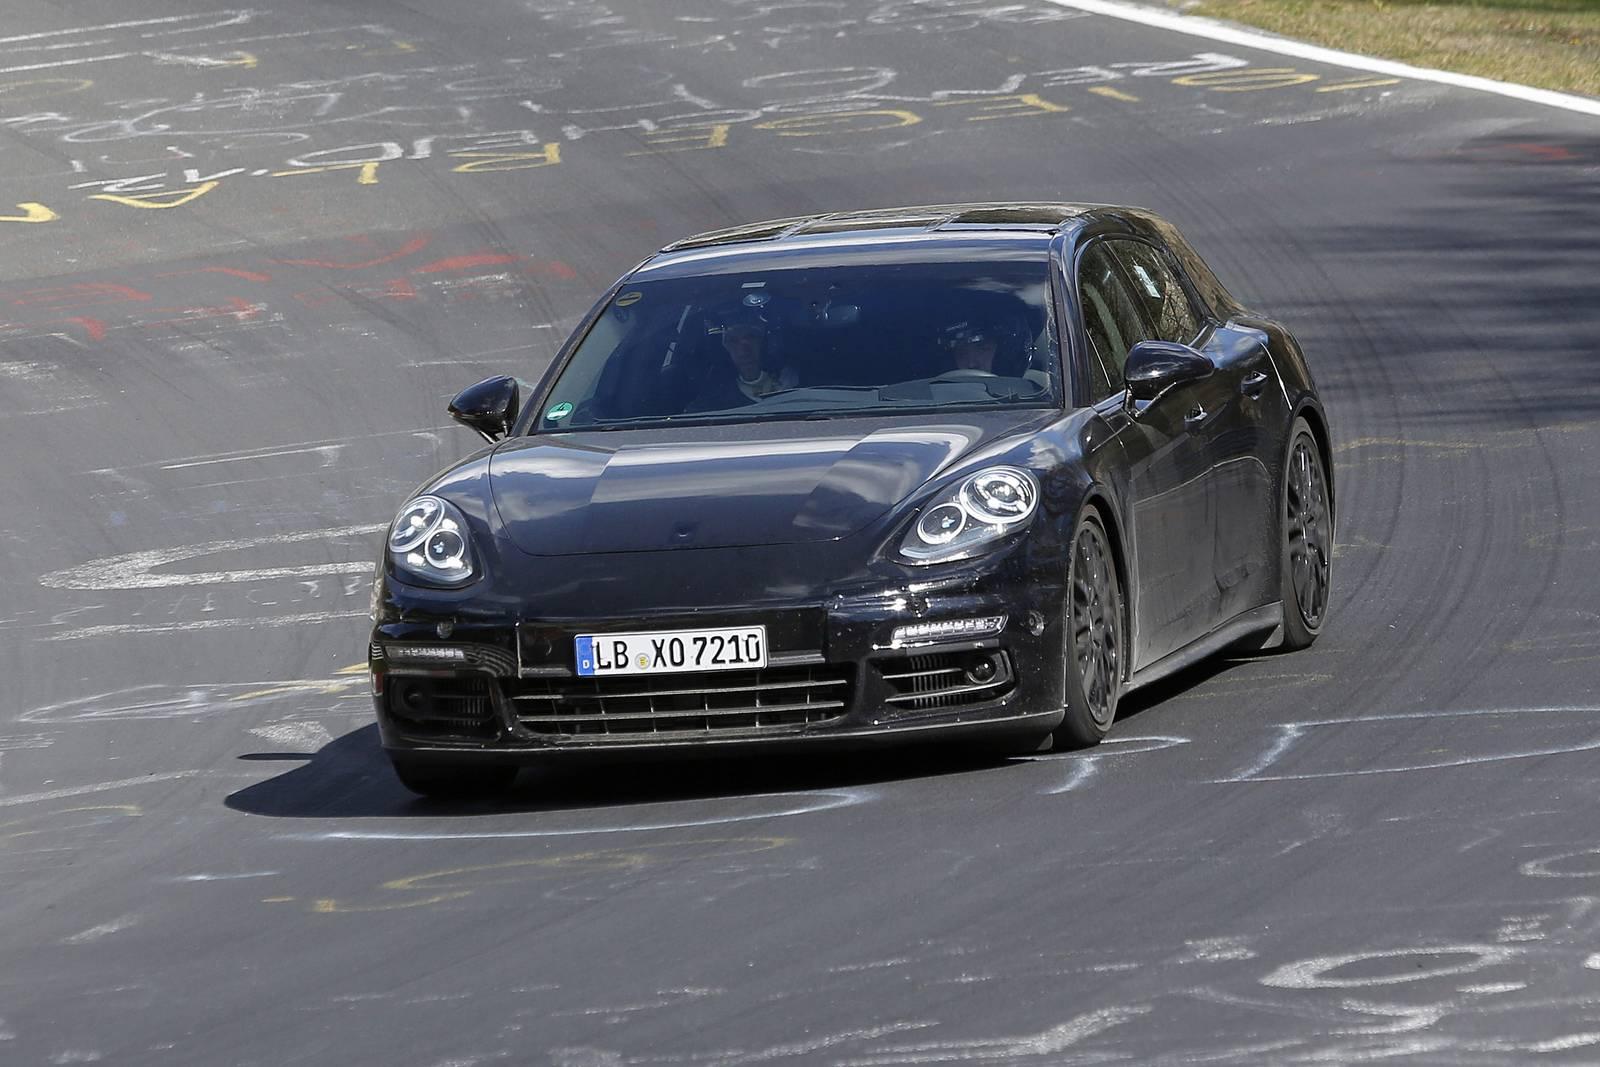 2018 porsche panamera shooting brake latest spy shots gtspirit - 2018 Porsche Panamera Shooting Brake 1 Of 8 Tags Porsche Panamera